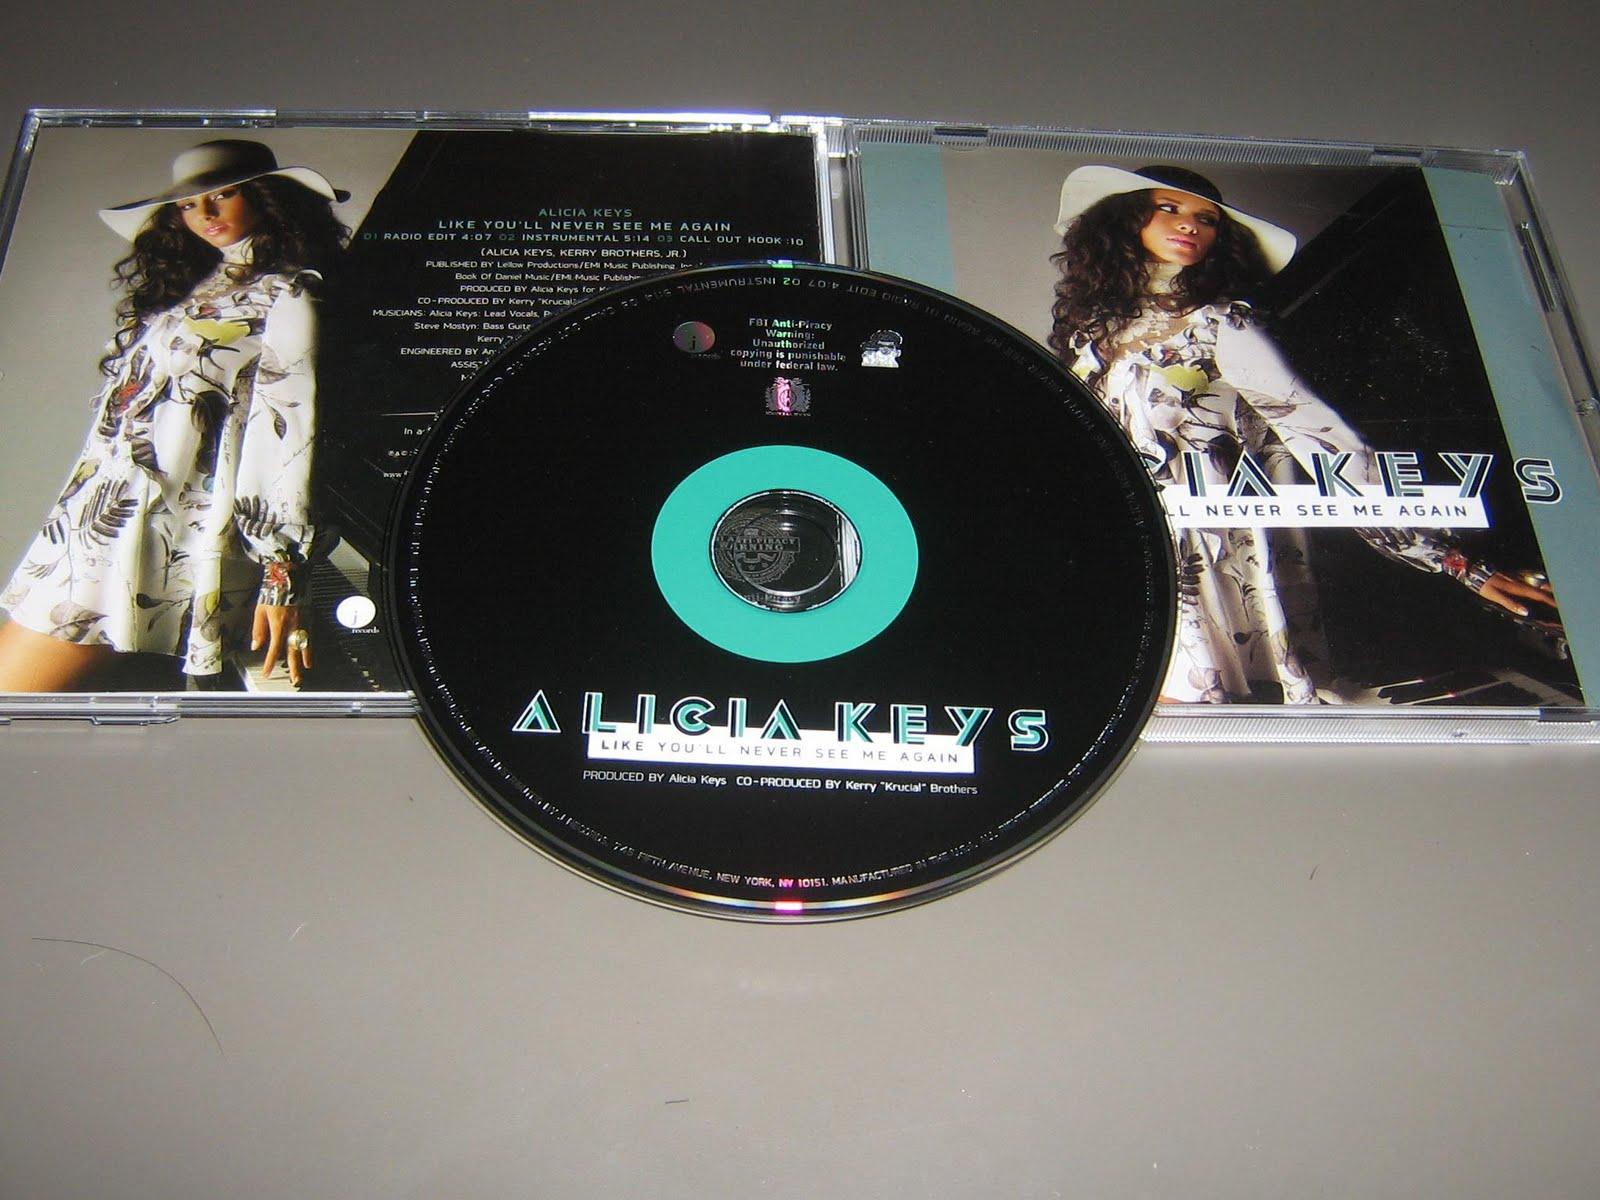 http://3.bp.blogspot.com/_9cw-jhhRBE4/TSasUu0E2sI/AAAAAAAAHjs/UJoD5q6WHQA/s1600/00-alicia_keys-like_youll_never_see_me_again-promo_cds-2007-cd.jpg